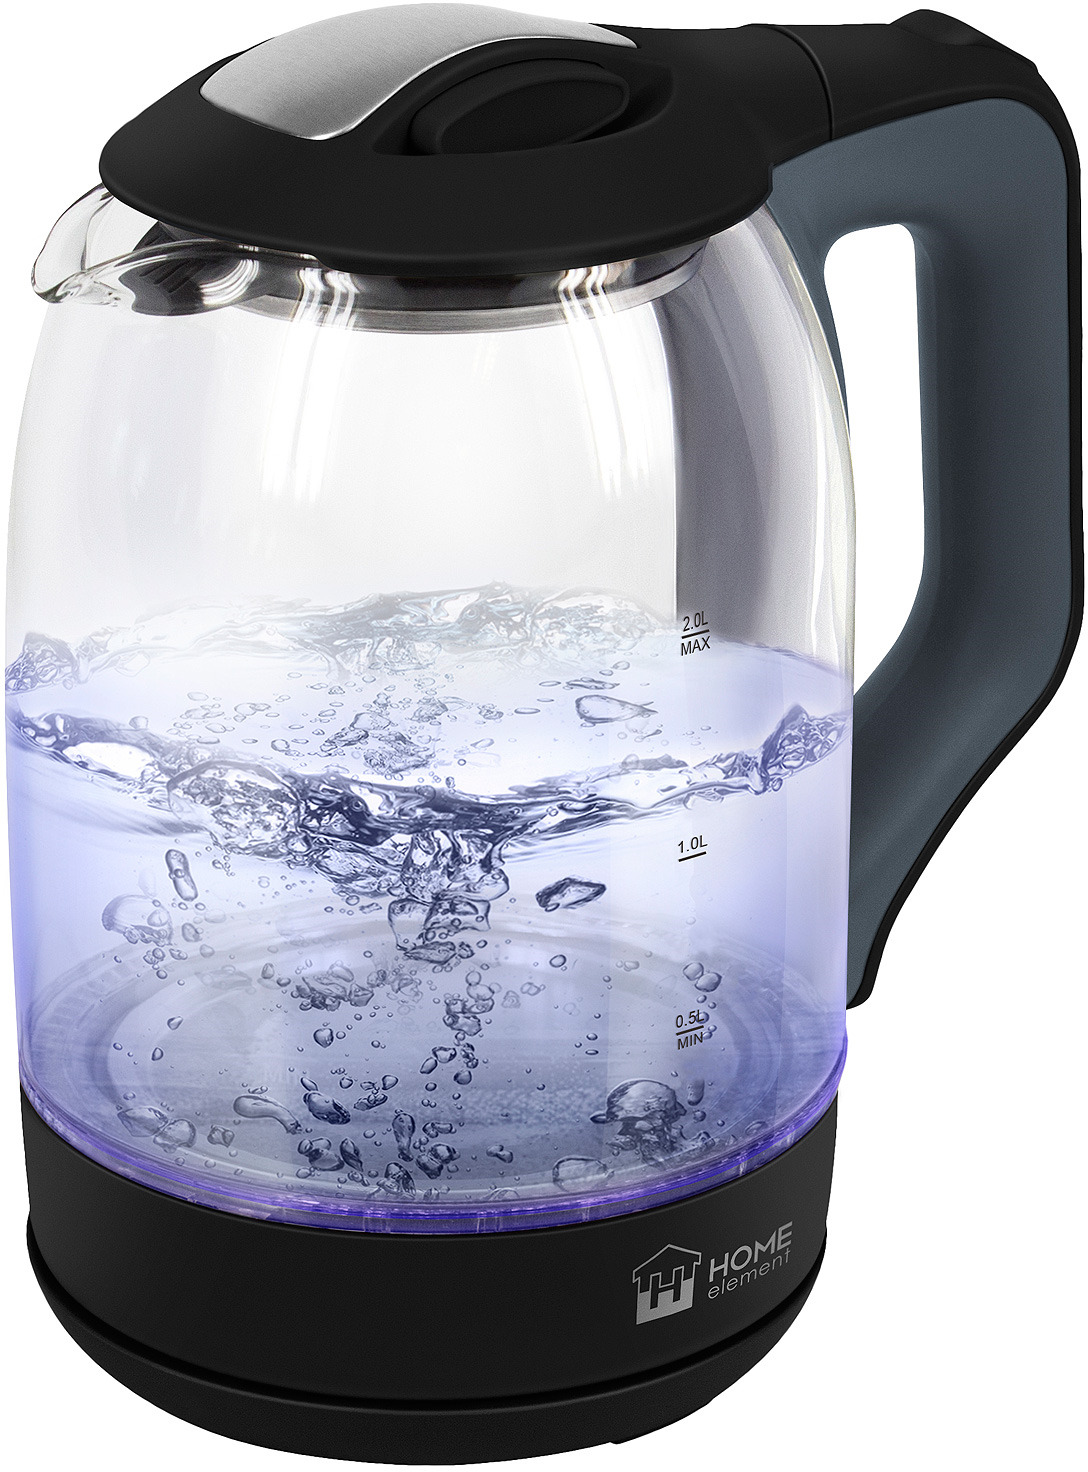 Электрический чайник Home Element HE-KT190, серый мрамор чайник home element he kt190 темный нефрит